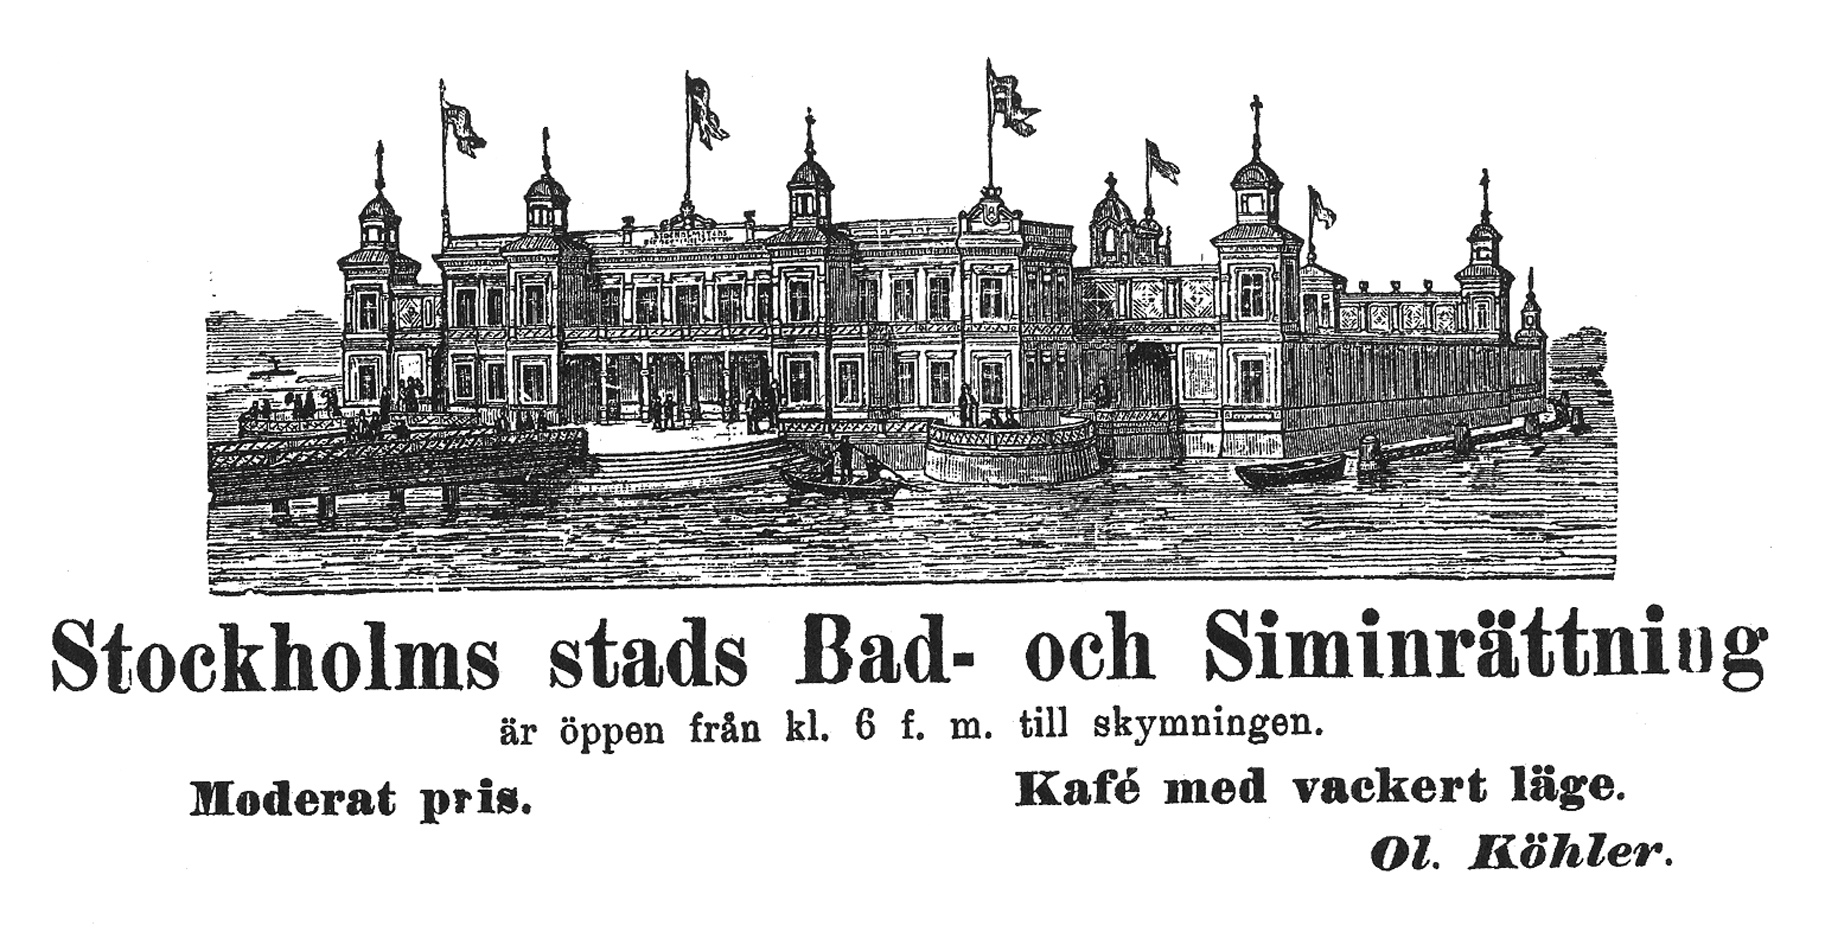 Inserzione pubblicitaria per i Flottans Badhus, 1898